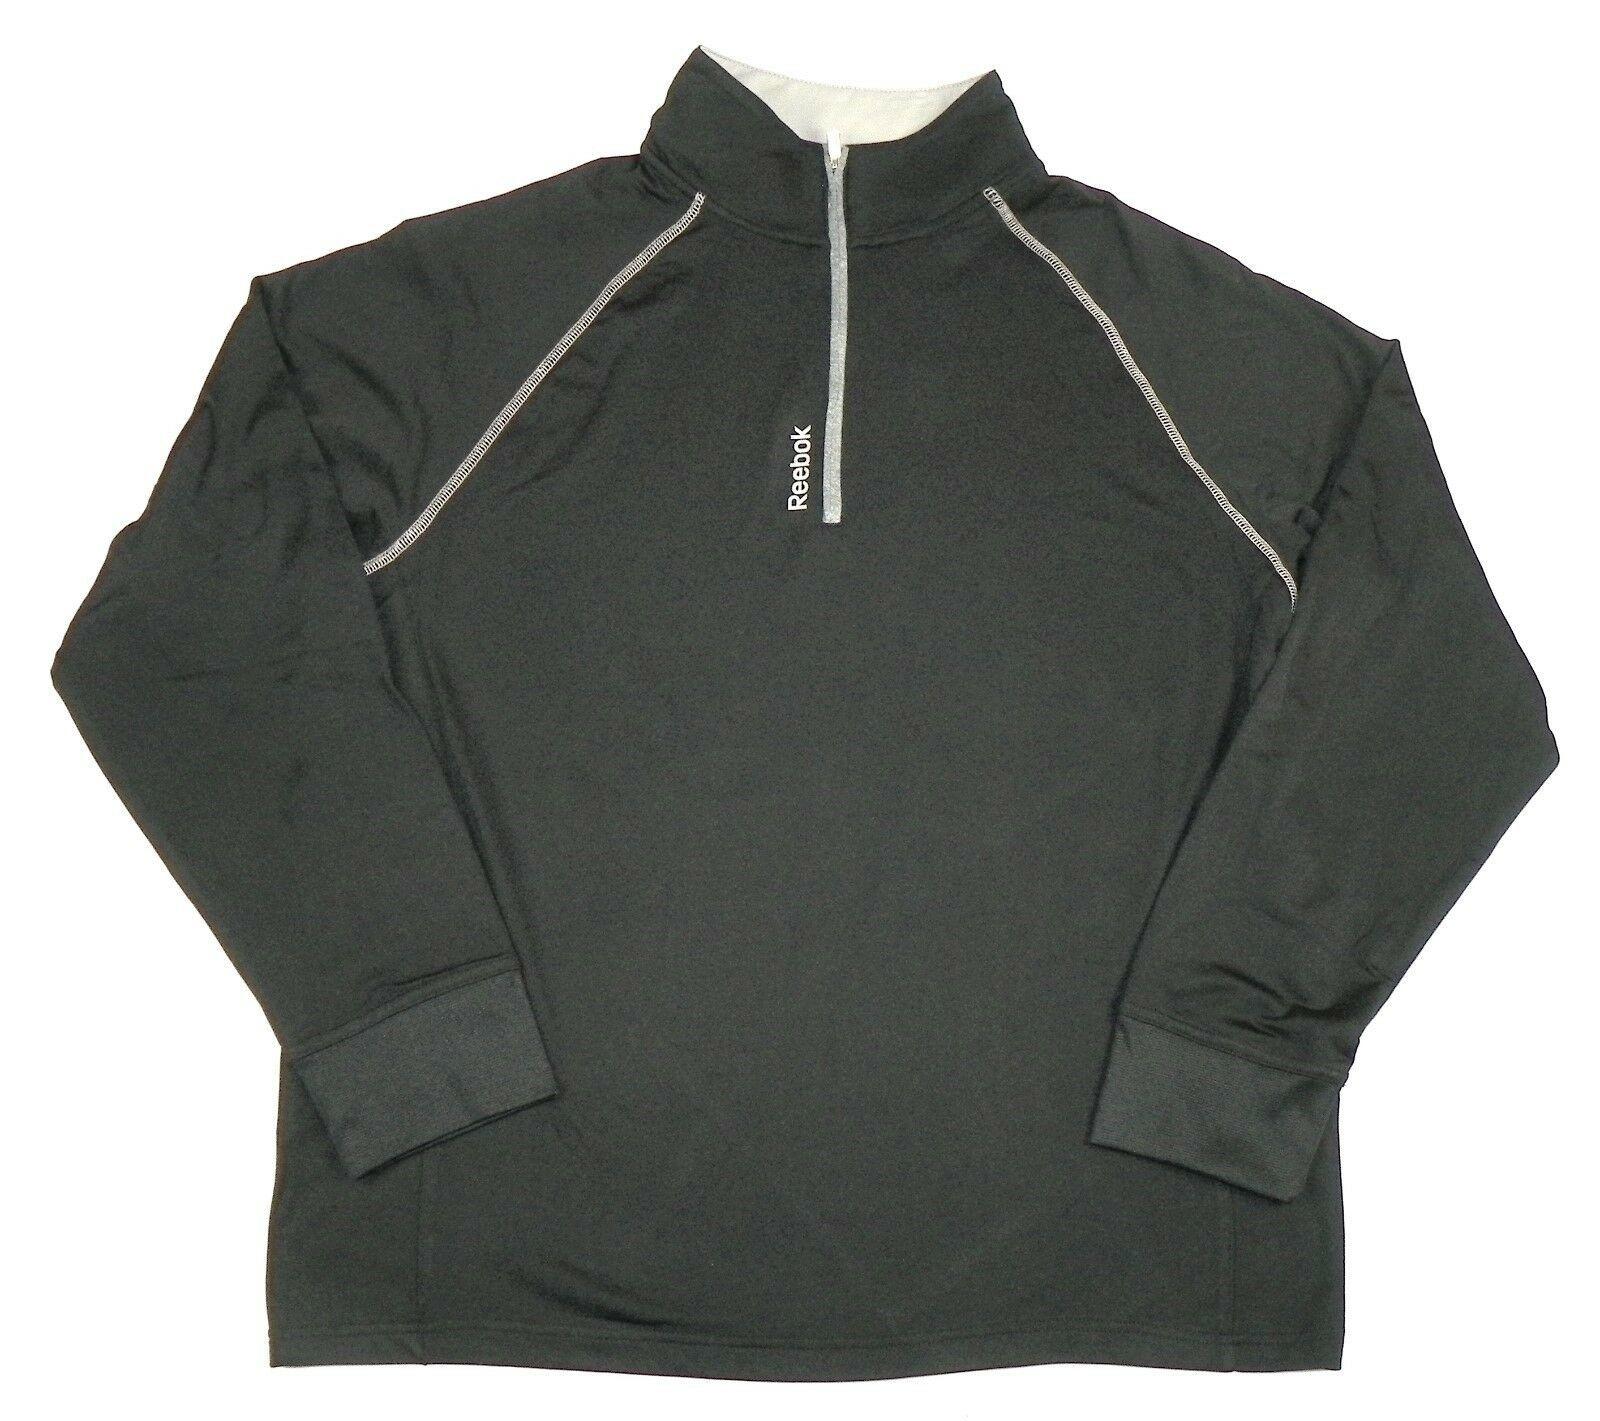 Men's Reebok Pullover Shirt 1/4 Zip Performance Long Sleeve Fitness Black NEW